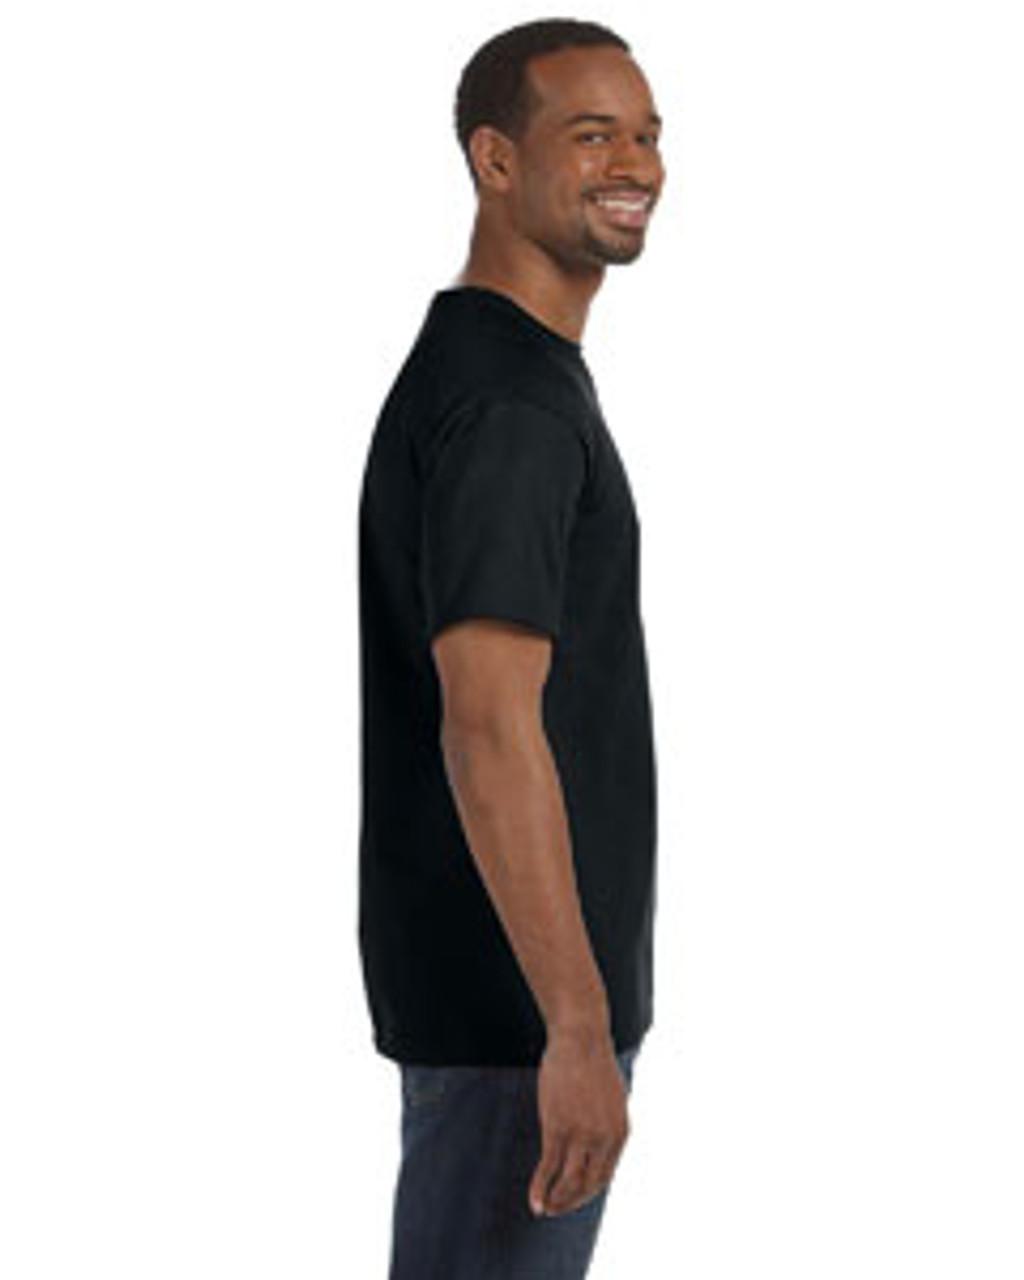 641b9520ed8907 ... Blank Next to Perfect 1 Dozen Pack T-shirts ...